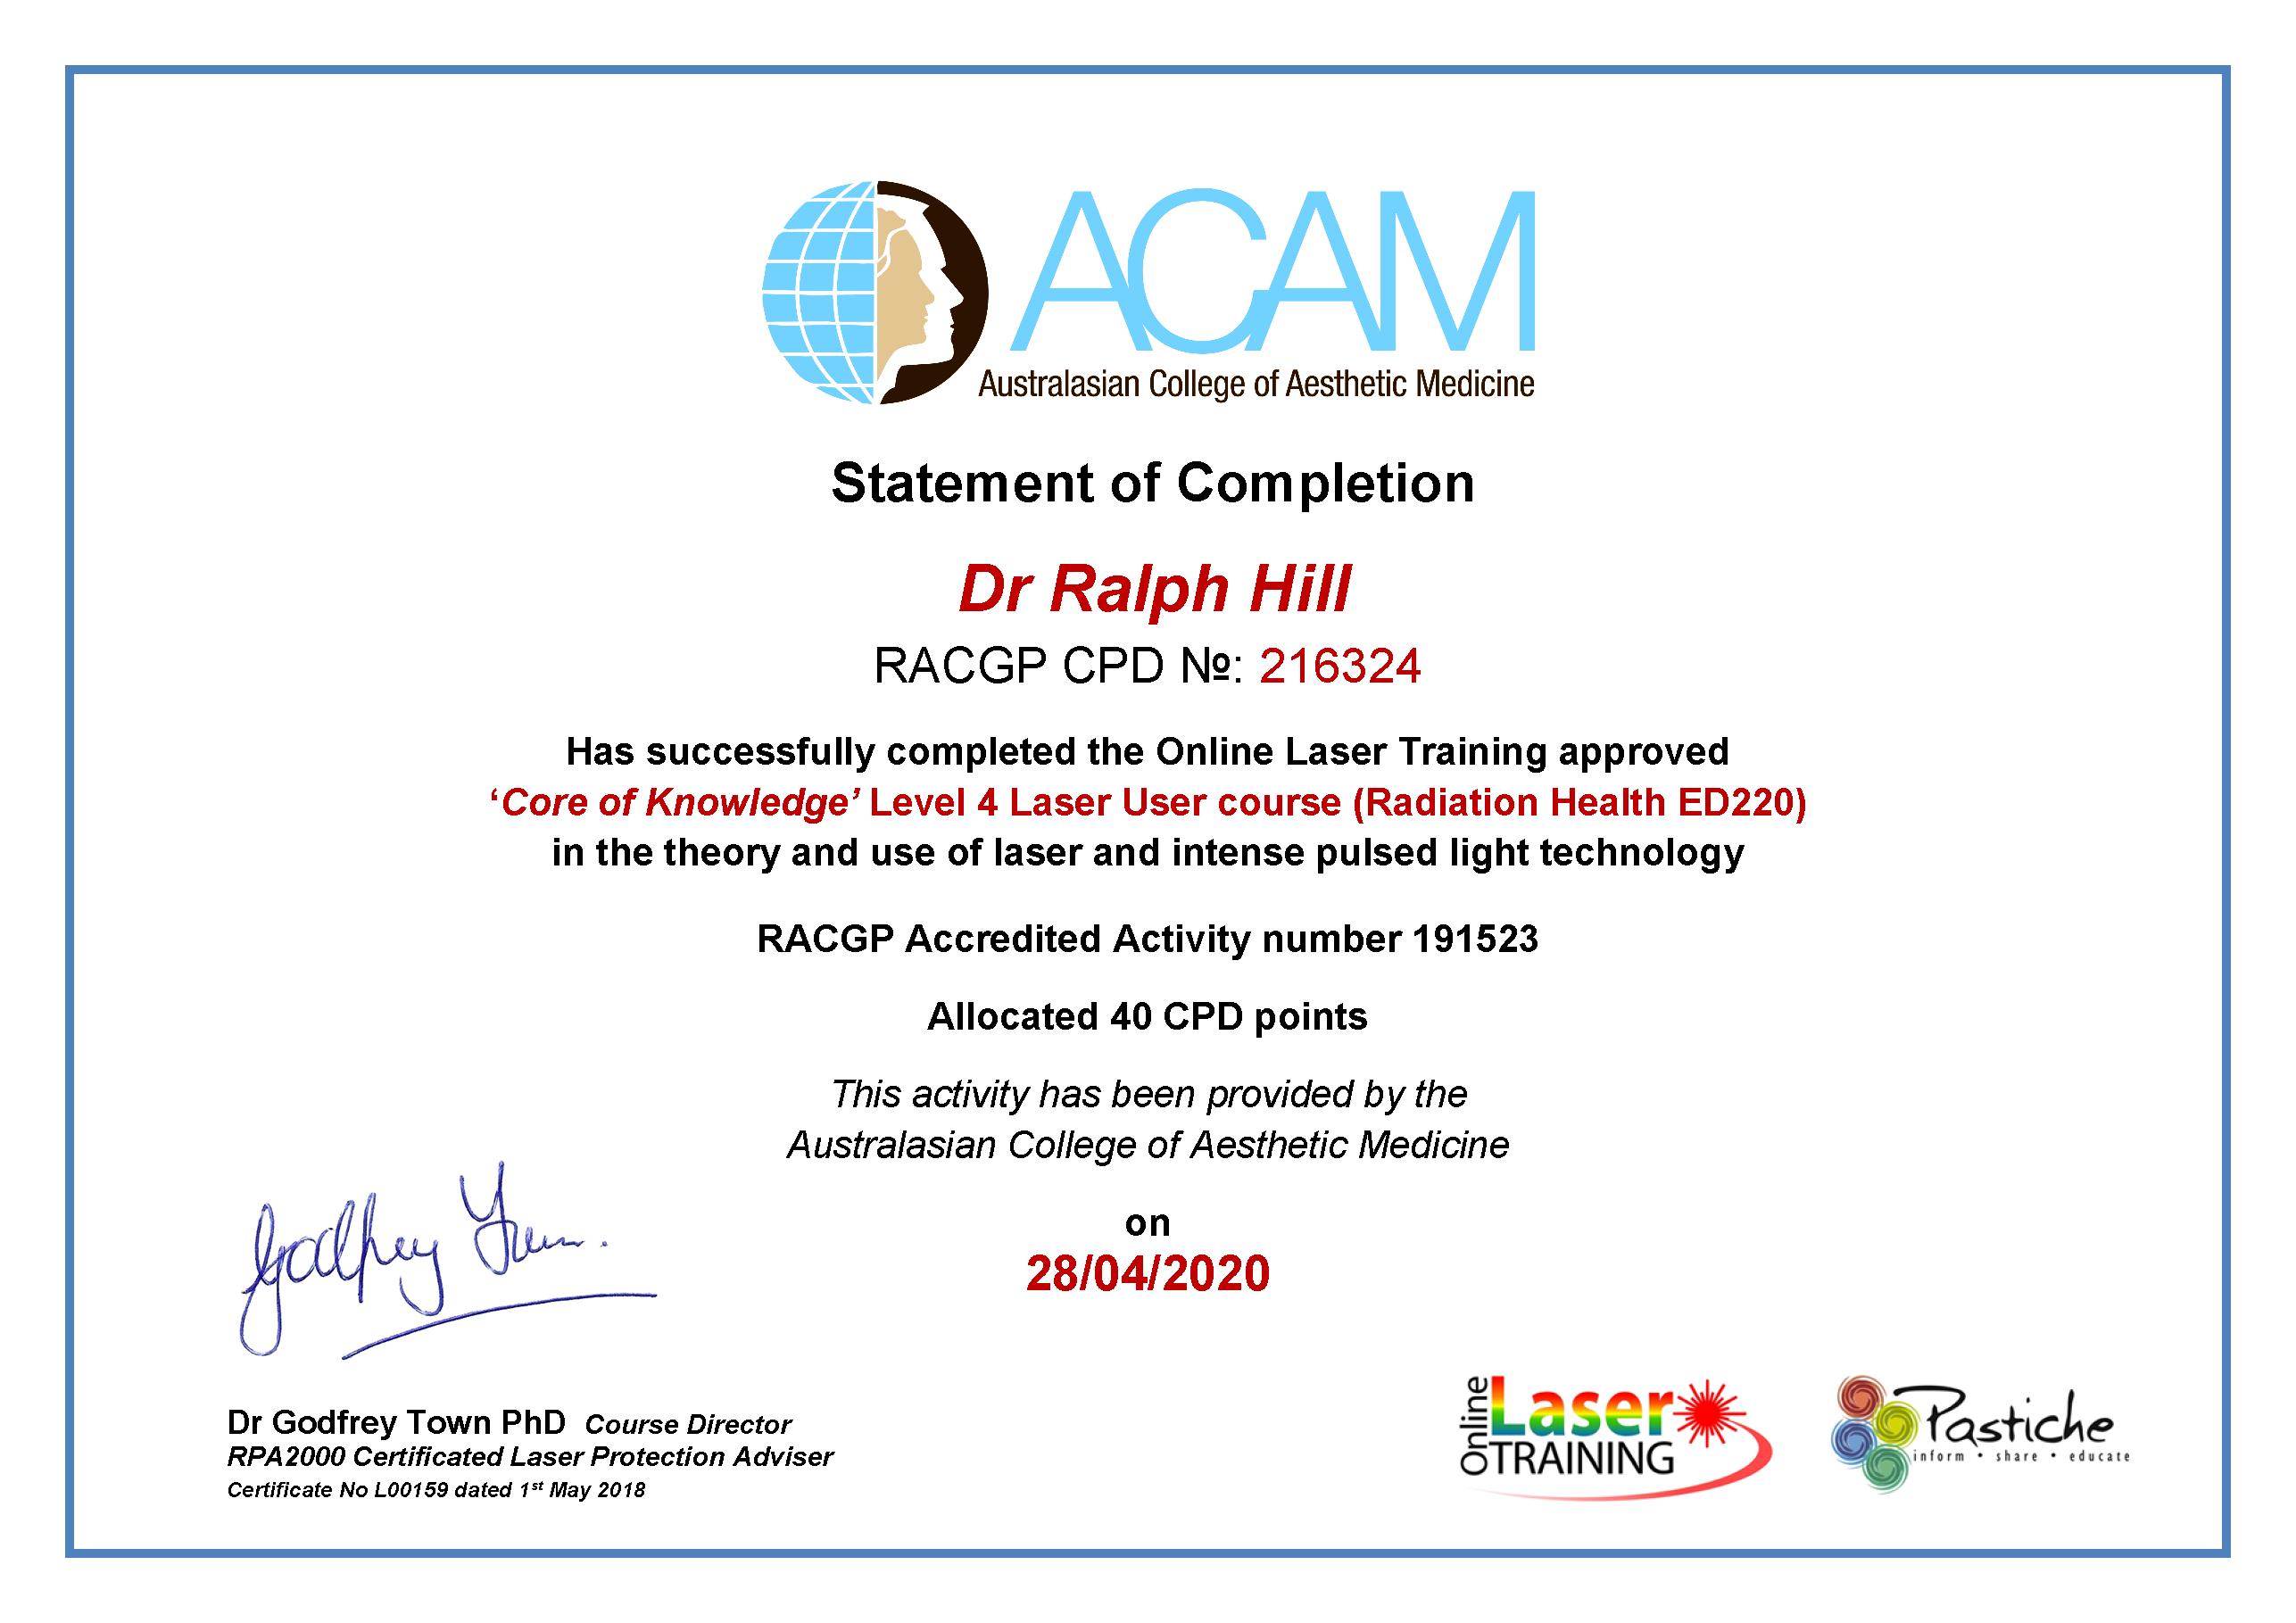 Example RAGCP certificate